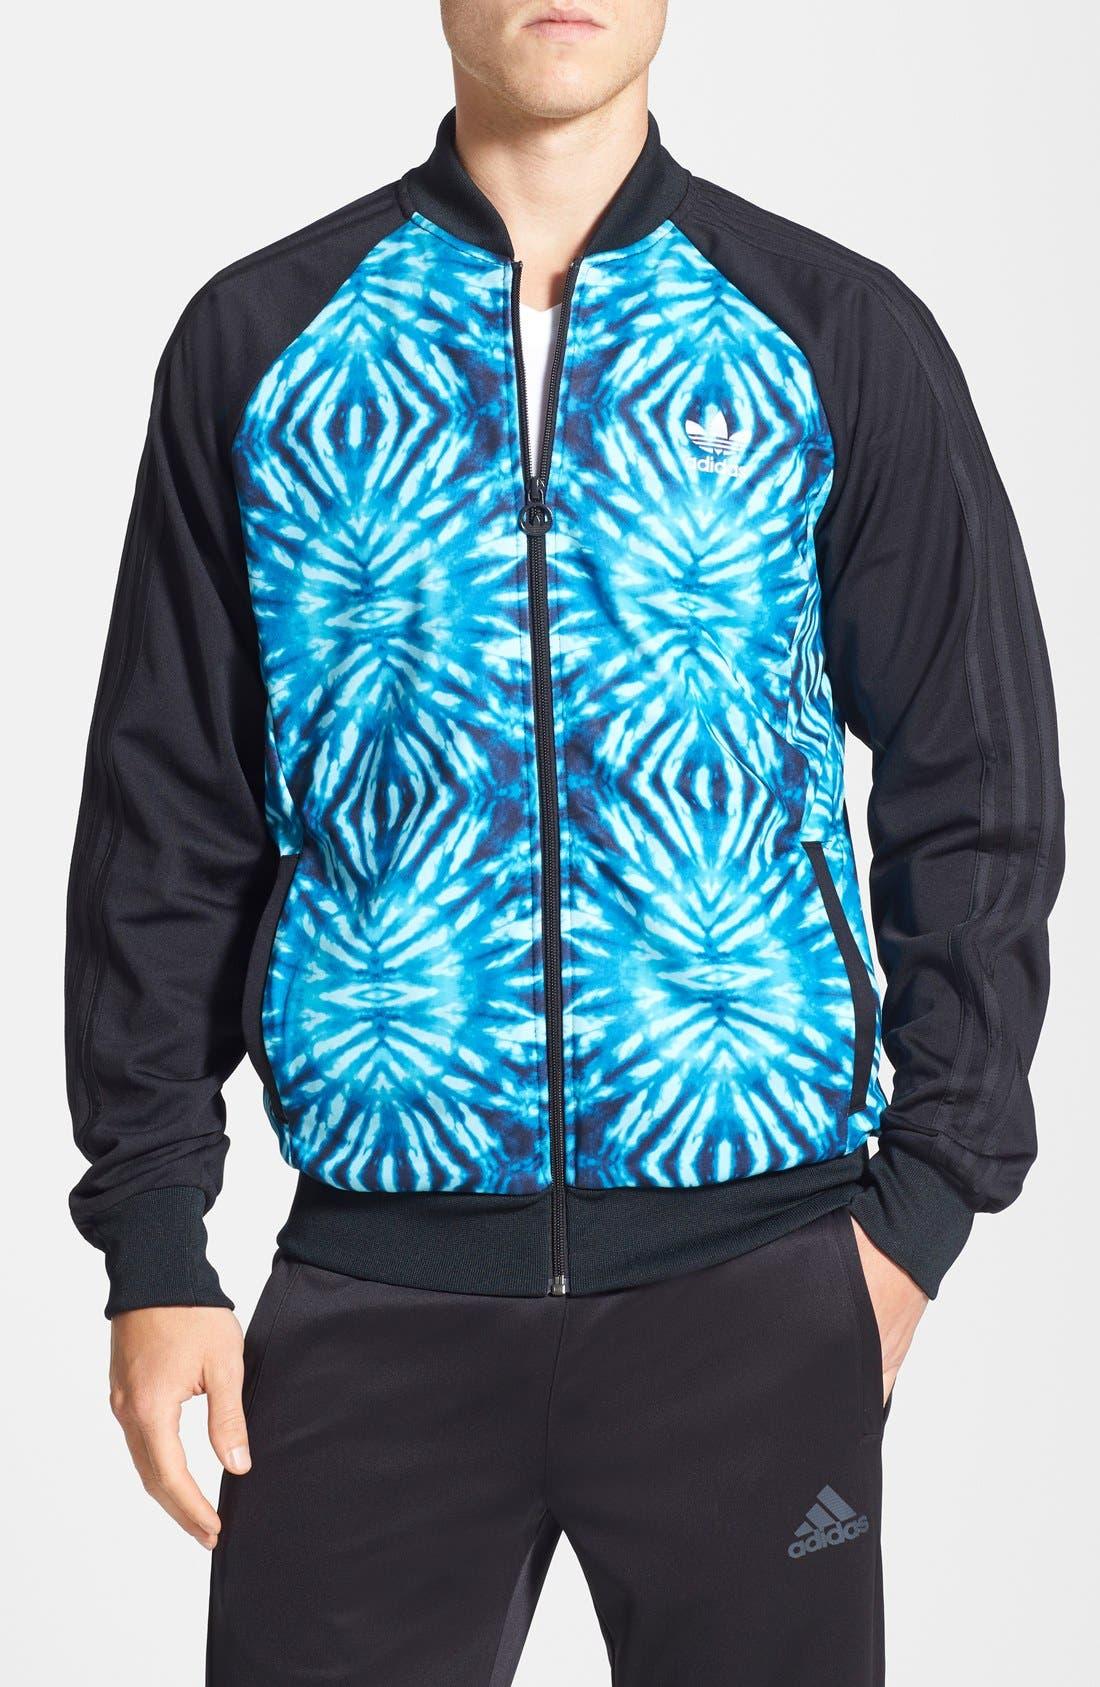 Alternate Image 1 Selected - adidas Originals 'Superstar Graphic' Raglan Sleeve Track Jacket